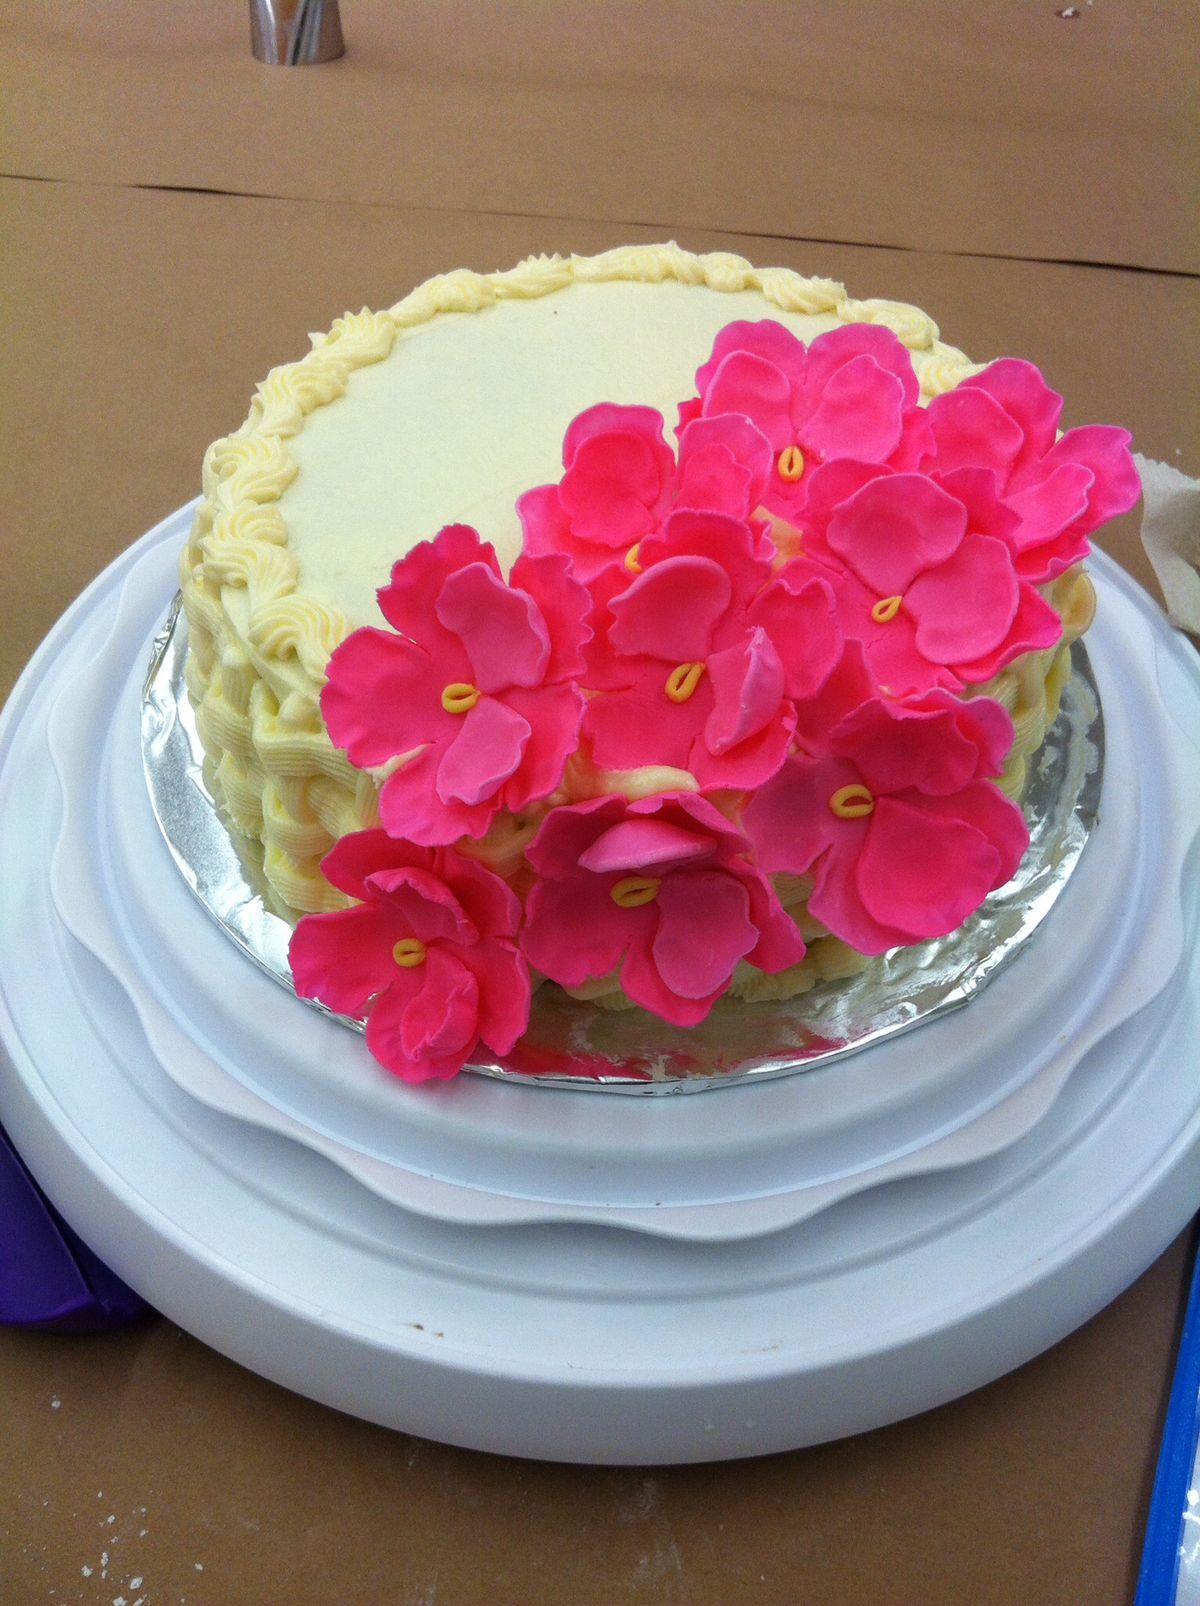 Wilton Cake Decorating Course Michaels : Wilton cake decorating, Wilton cakes and Soap cake on ...